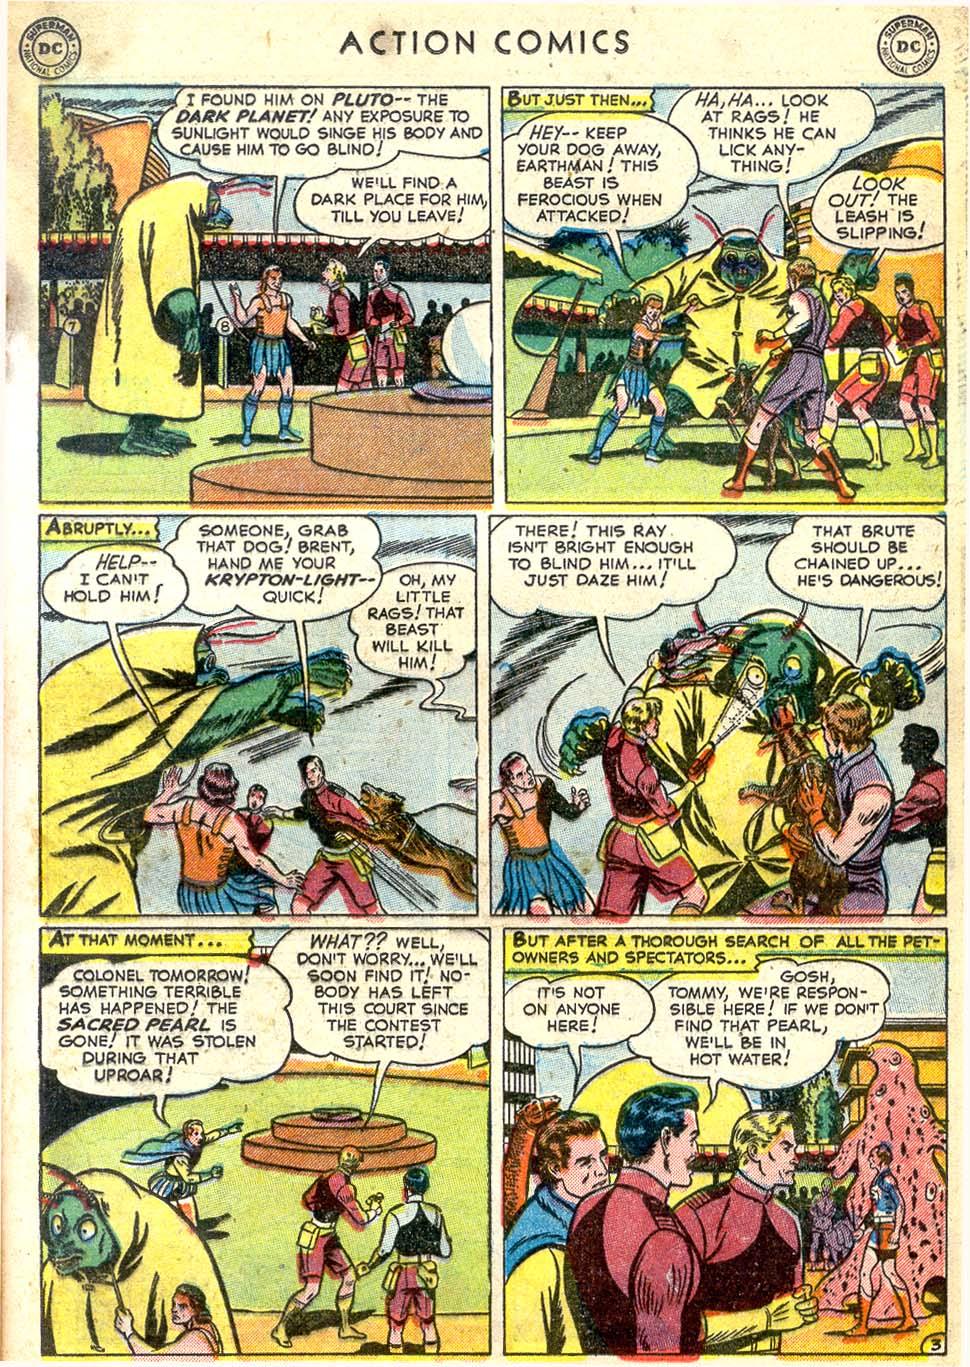 Action Comics (1938) 164 Page 26